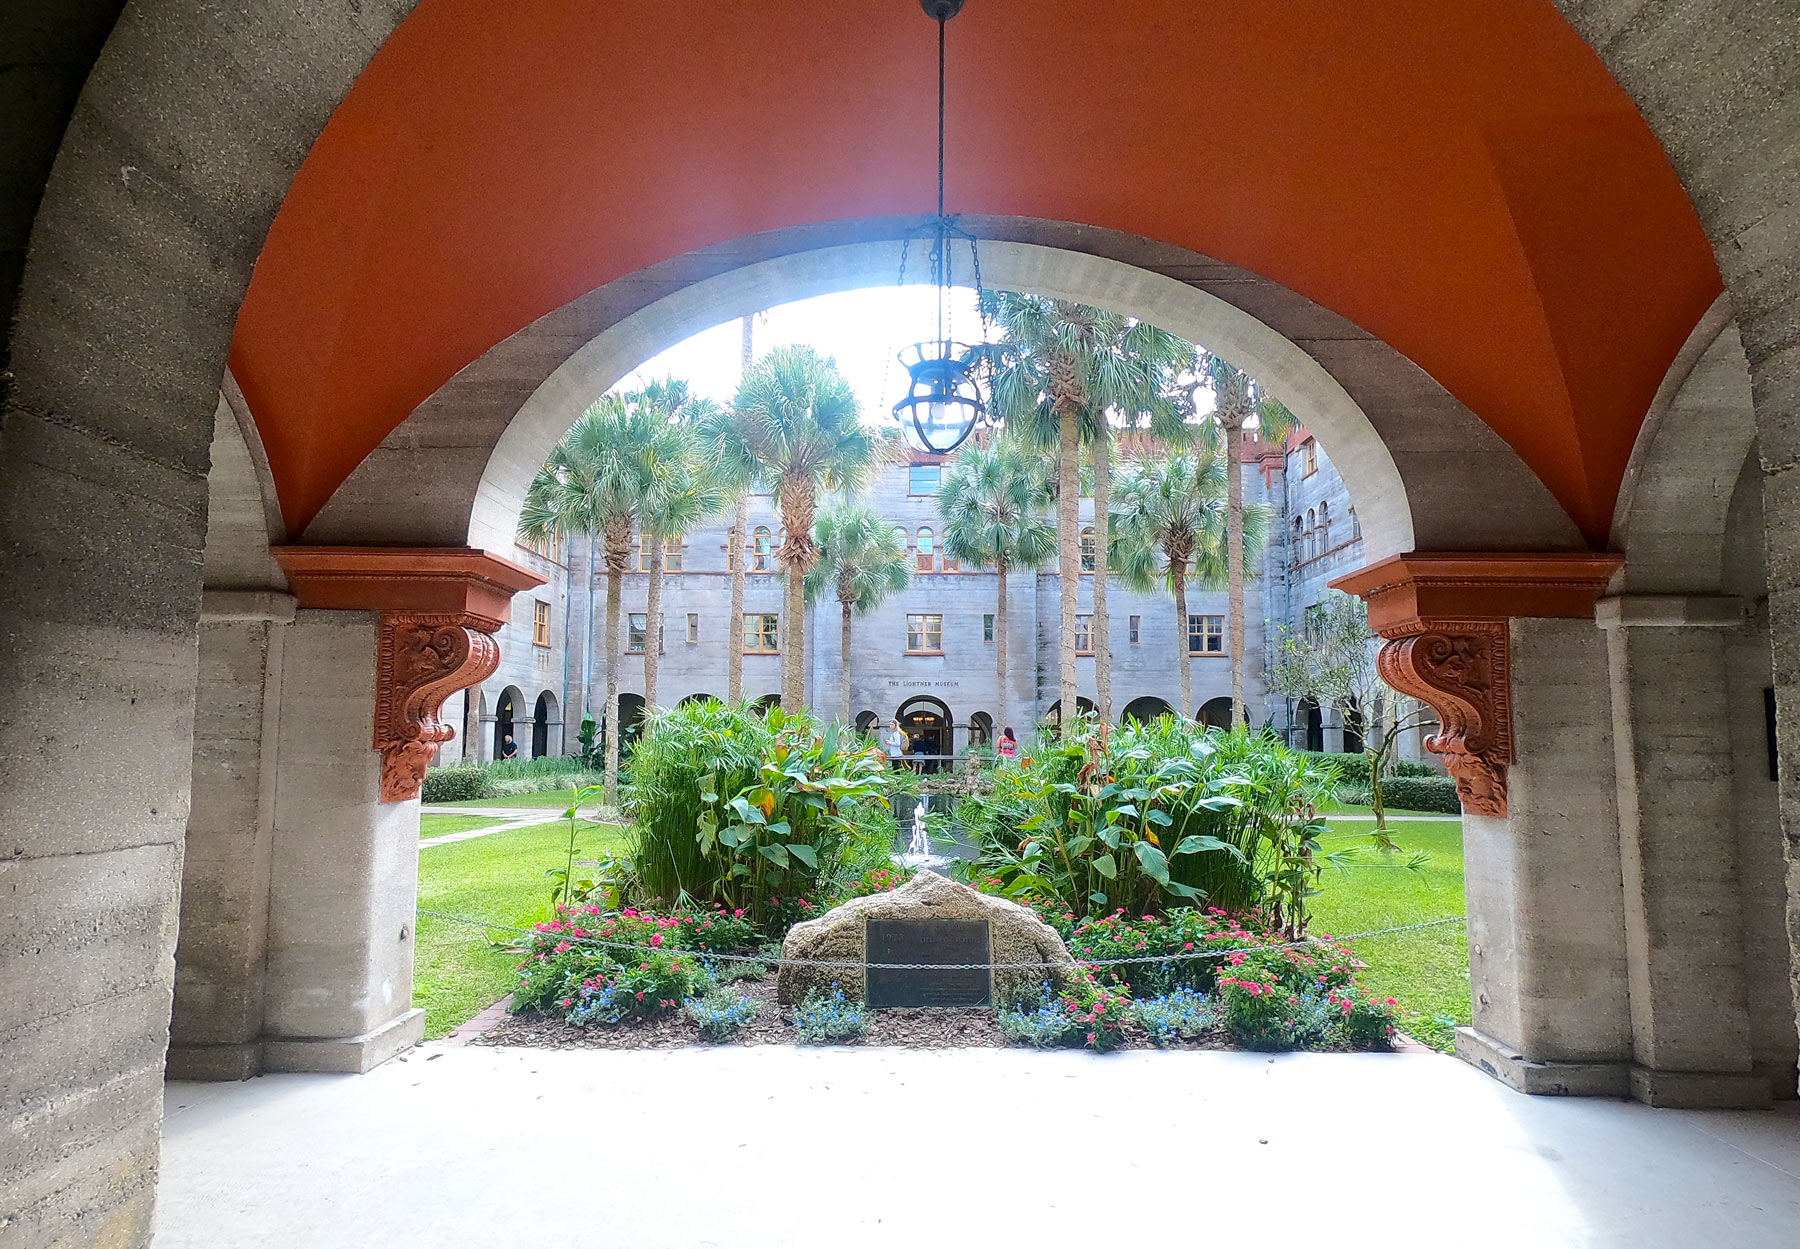 Arched brick walkway entrance to Lightner Museum courtyard in Saint Augustine, Florida